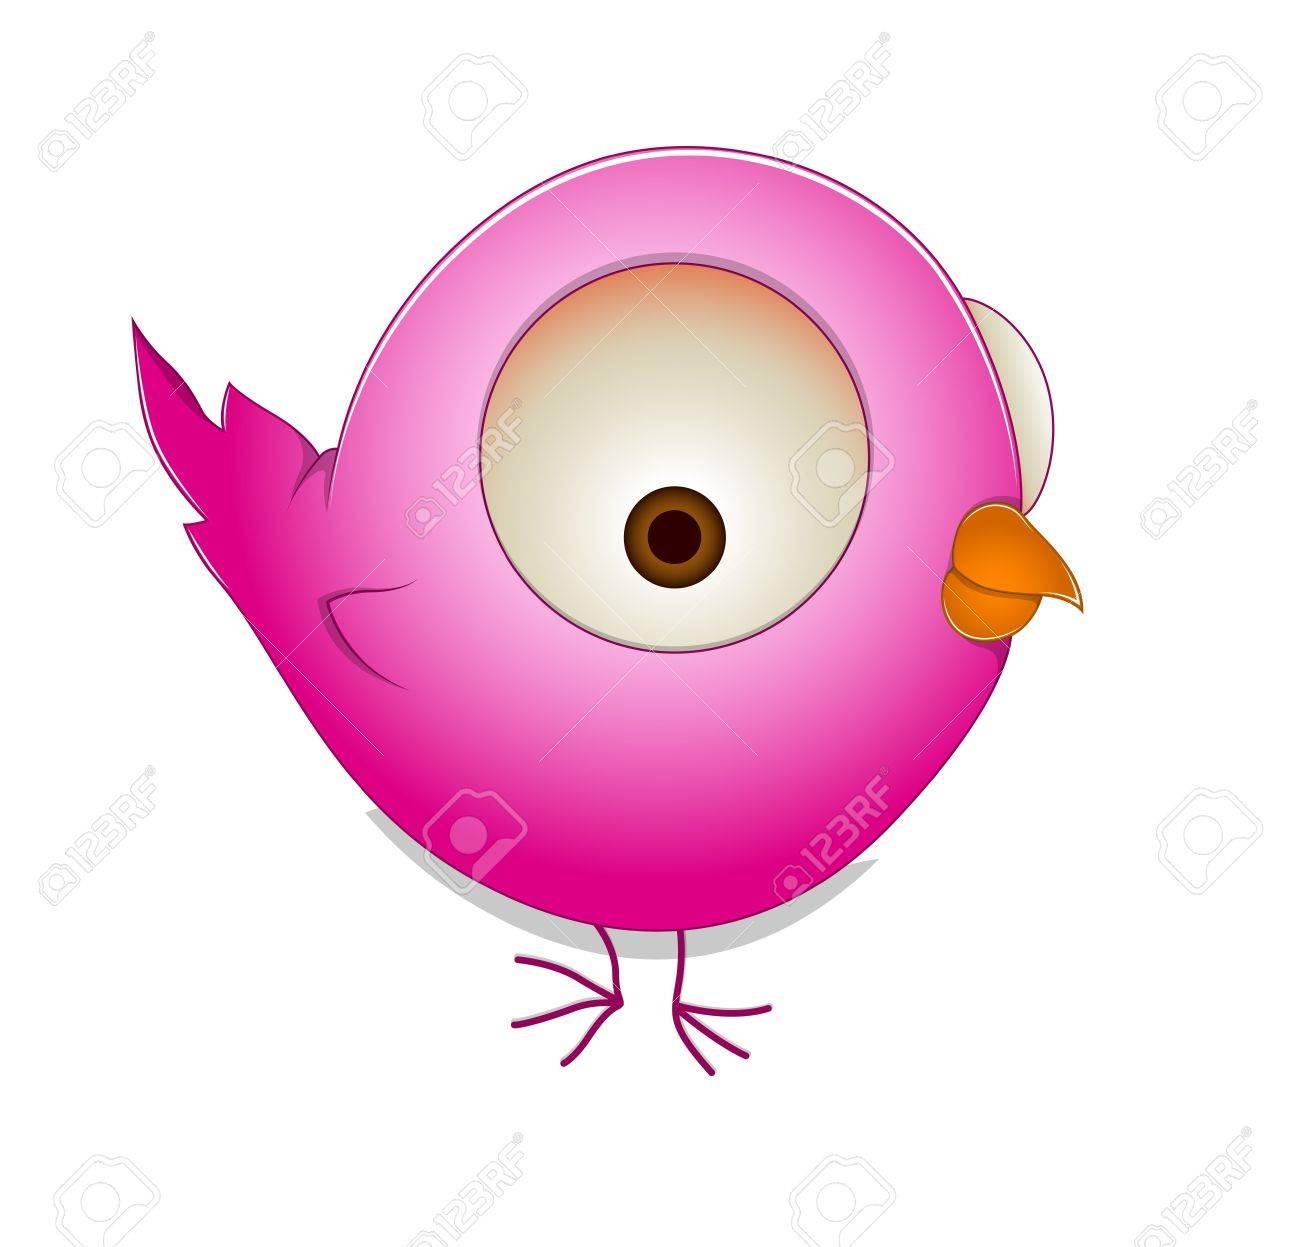 Cute Cartoon Bird Stock Vector - 13357967